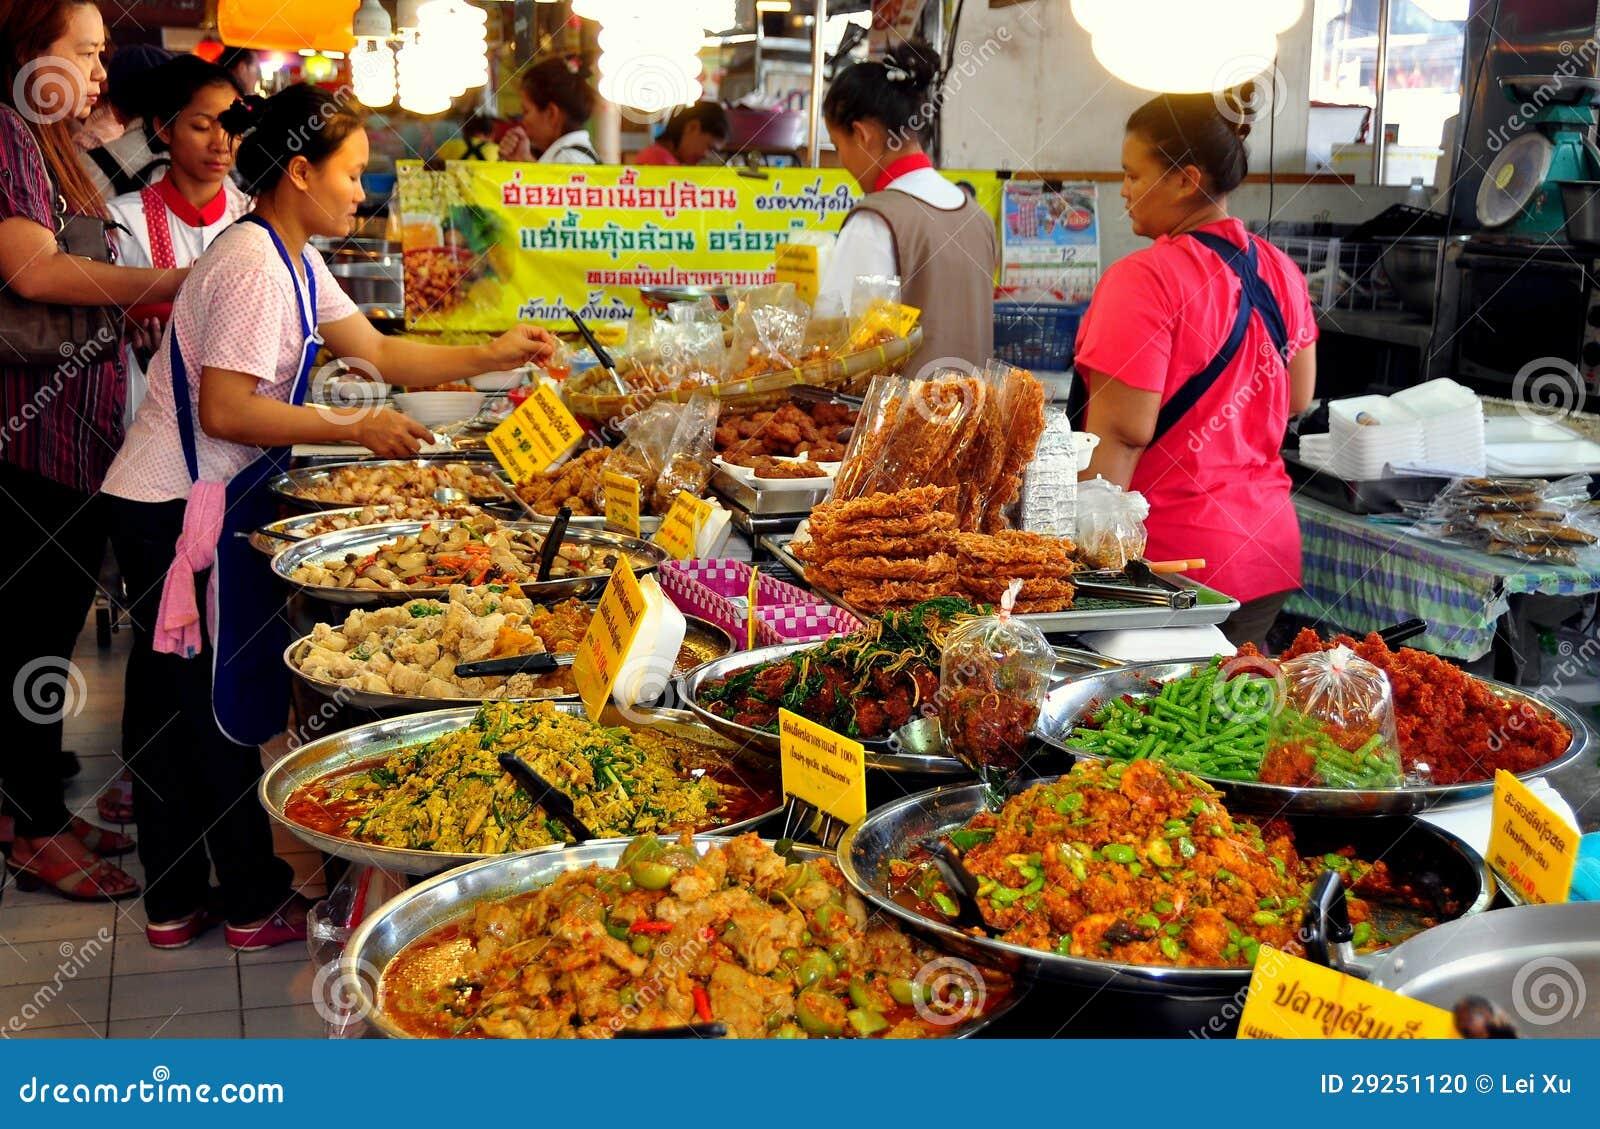 Bangkok, Thailand: Or Tor Kor Food Market Editorial Image - Image ...